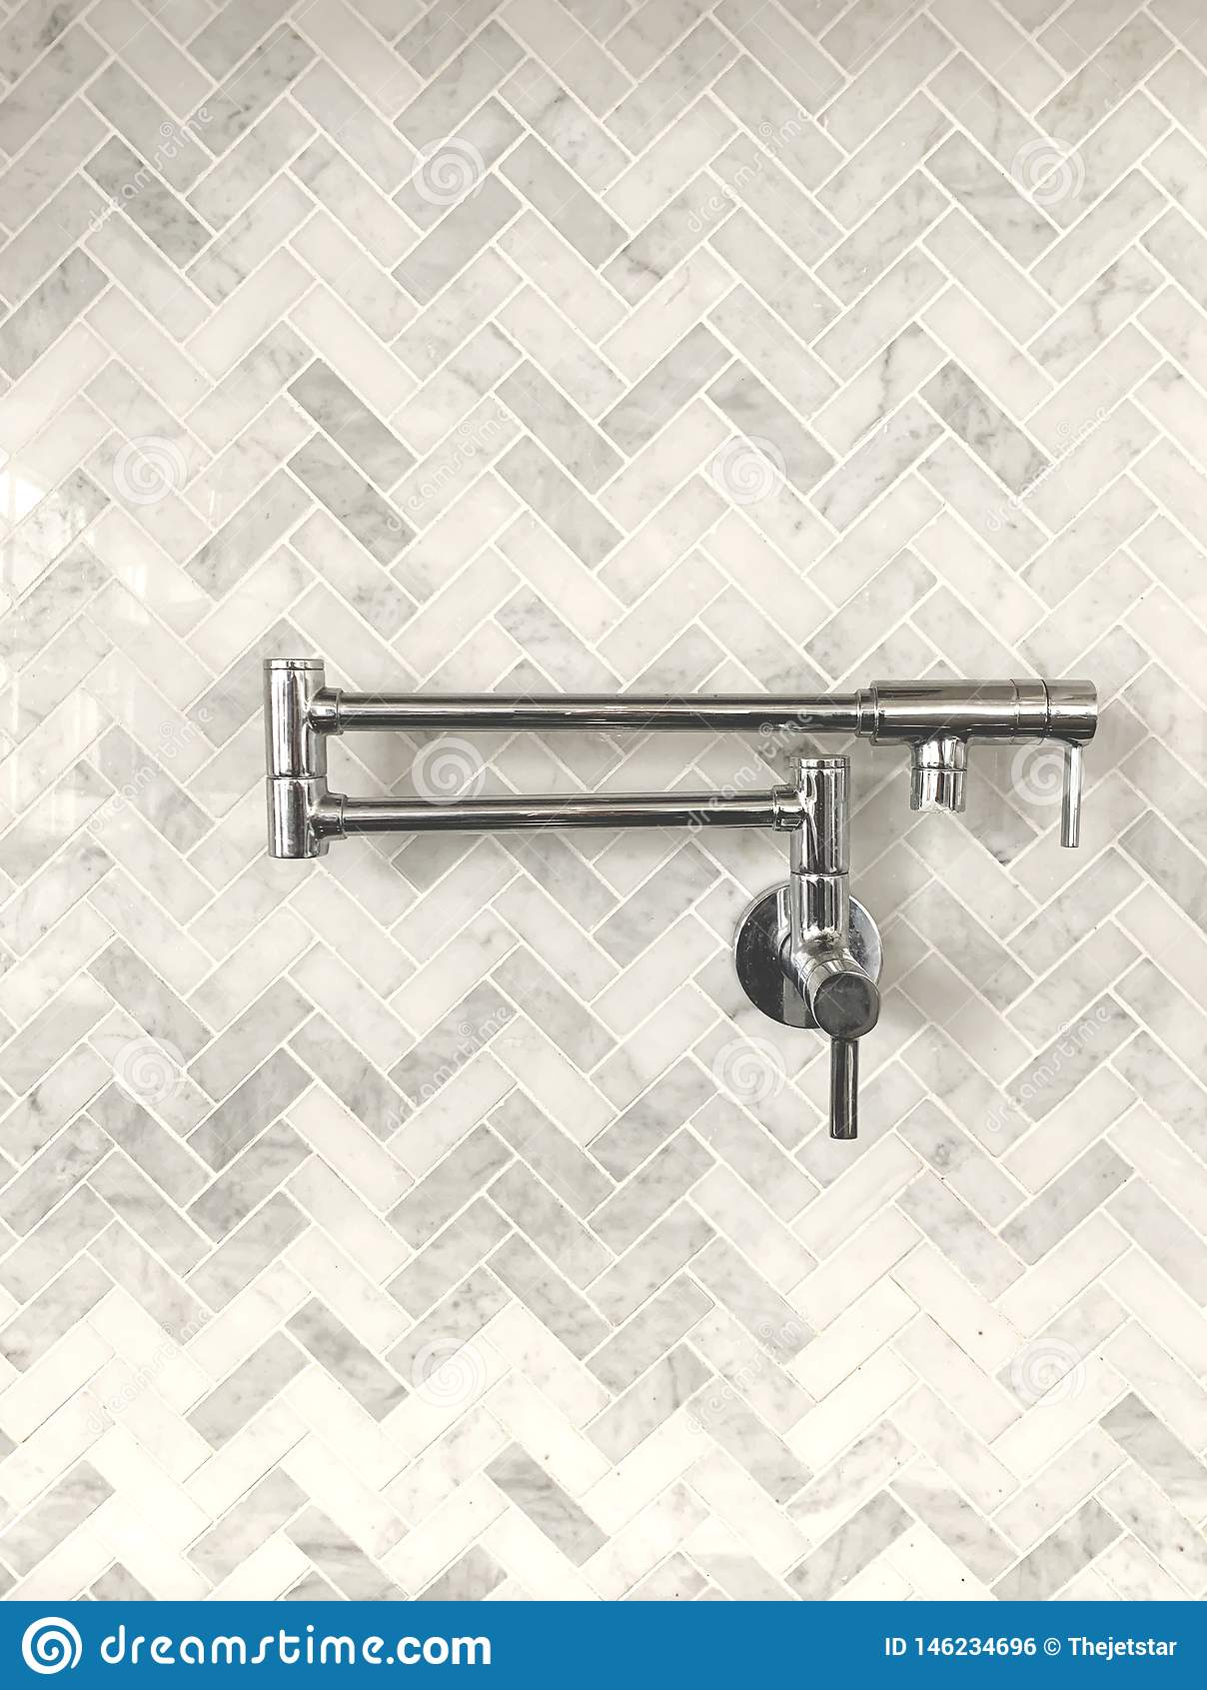 Pot Filler Marble Herringbone Backsplash Modern Kitchen Stock Photo Image Of Gourmet Texture 146234696